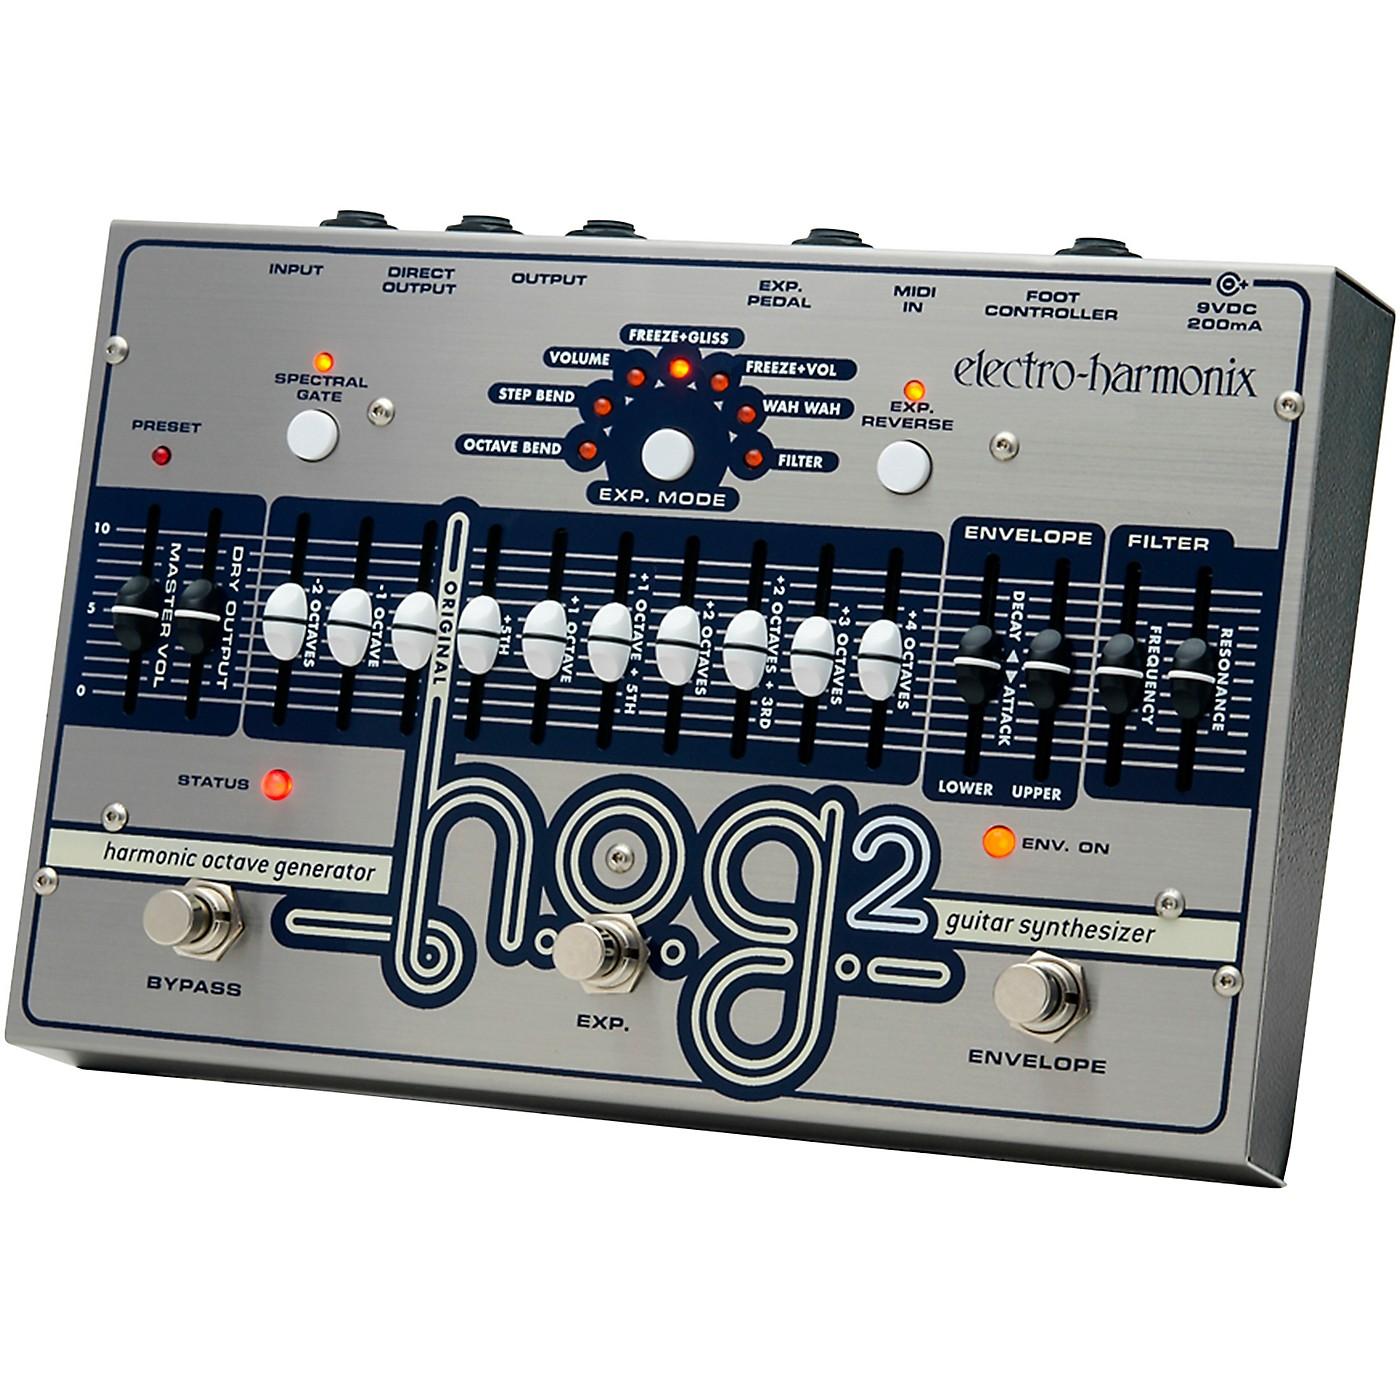 Electro-Harmonix HOG 2 Harmonic Octave Generator Guitar Effects Pedal thumbnail